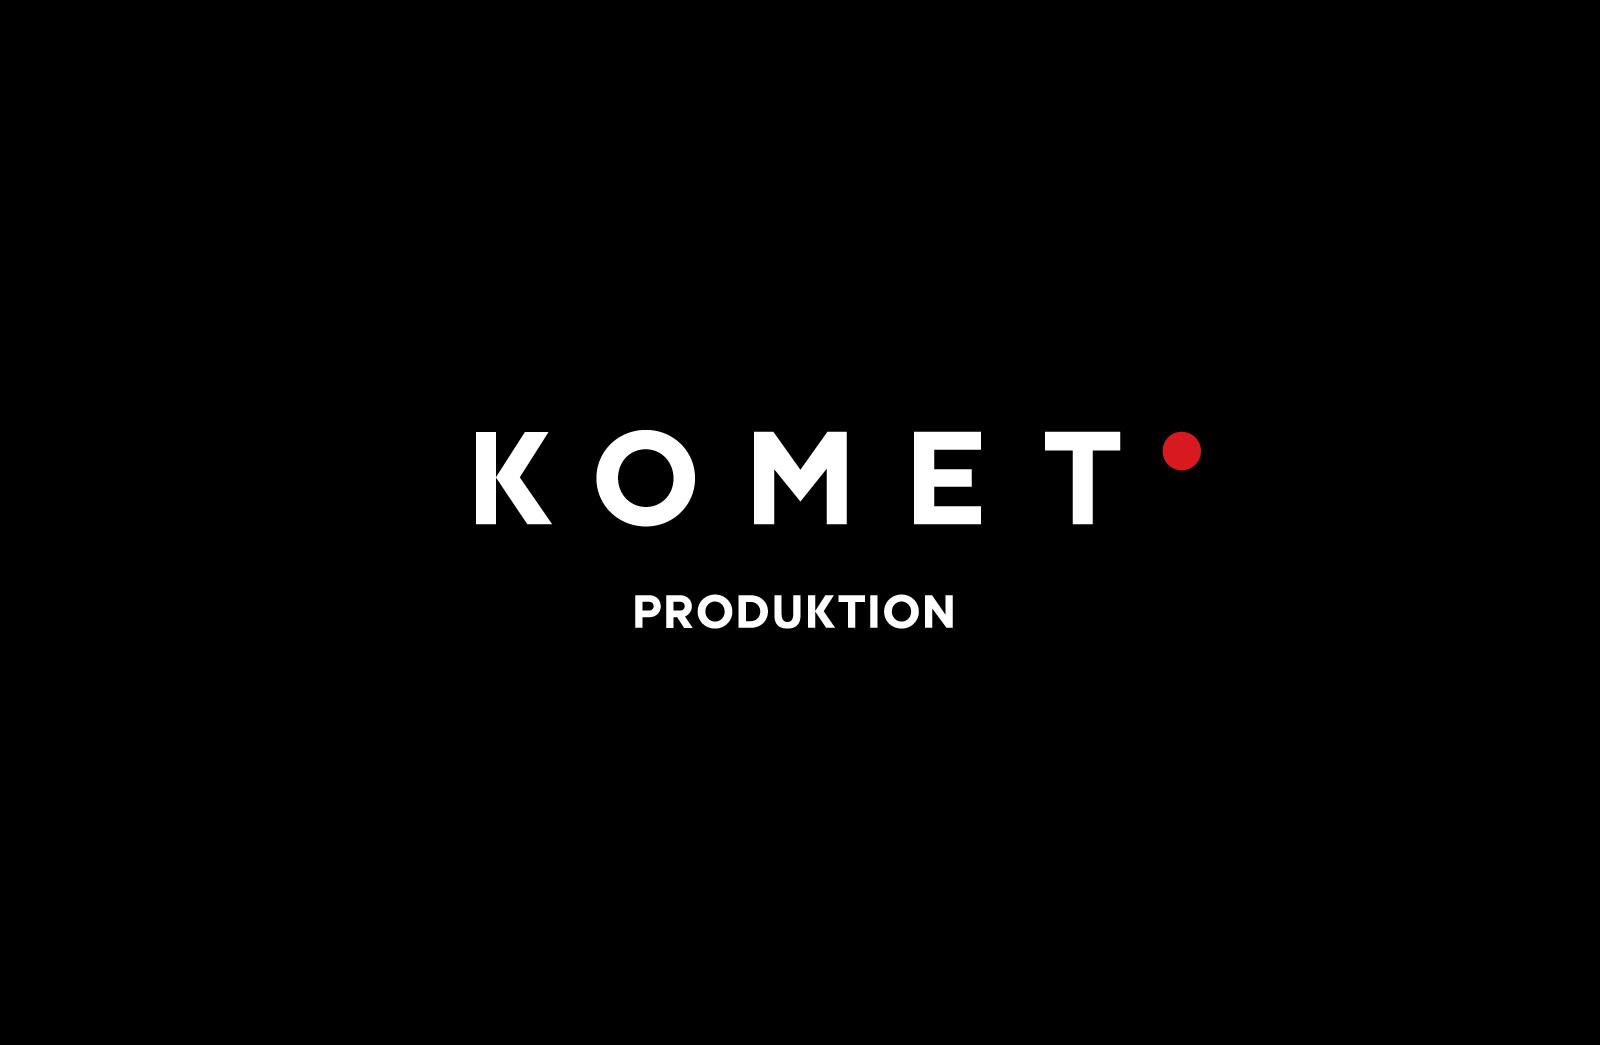 05_Komet_negative